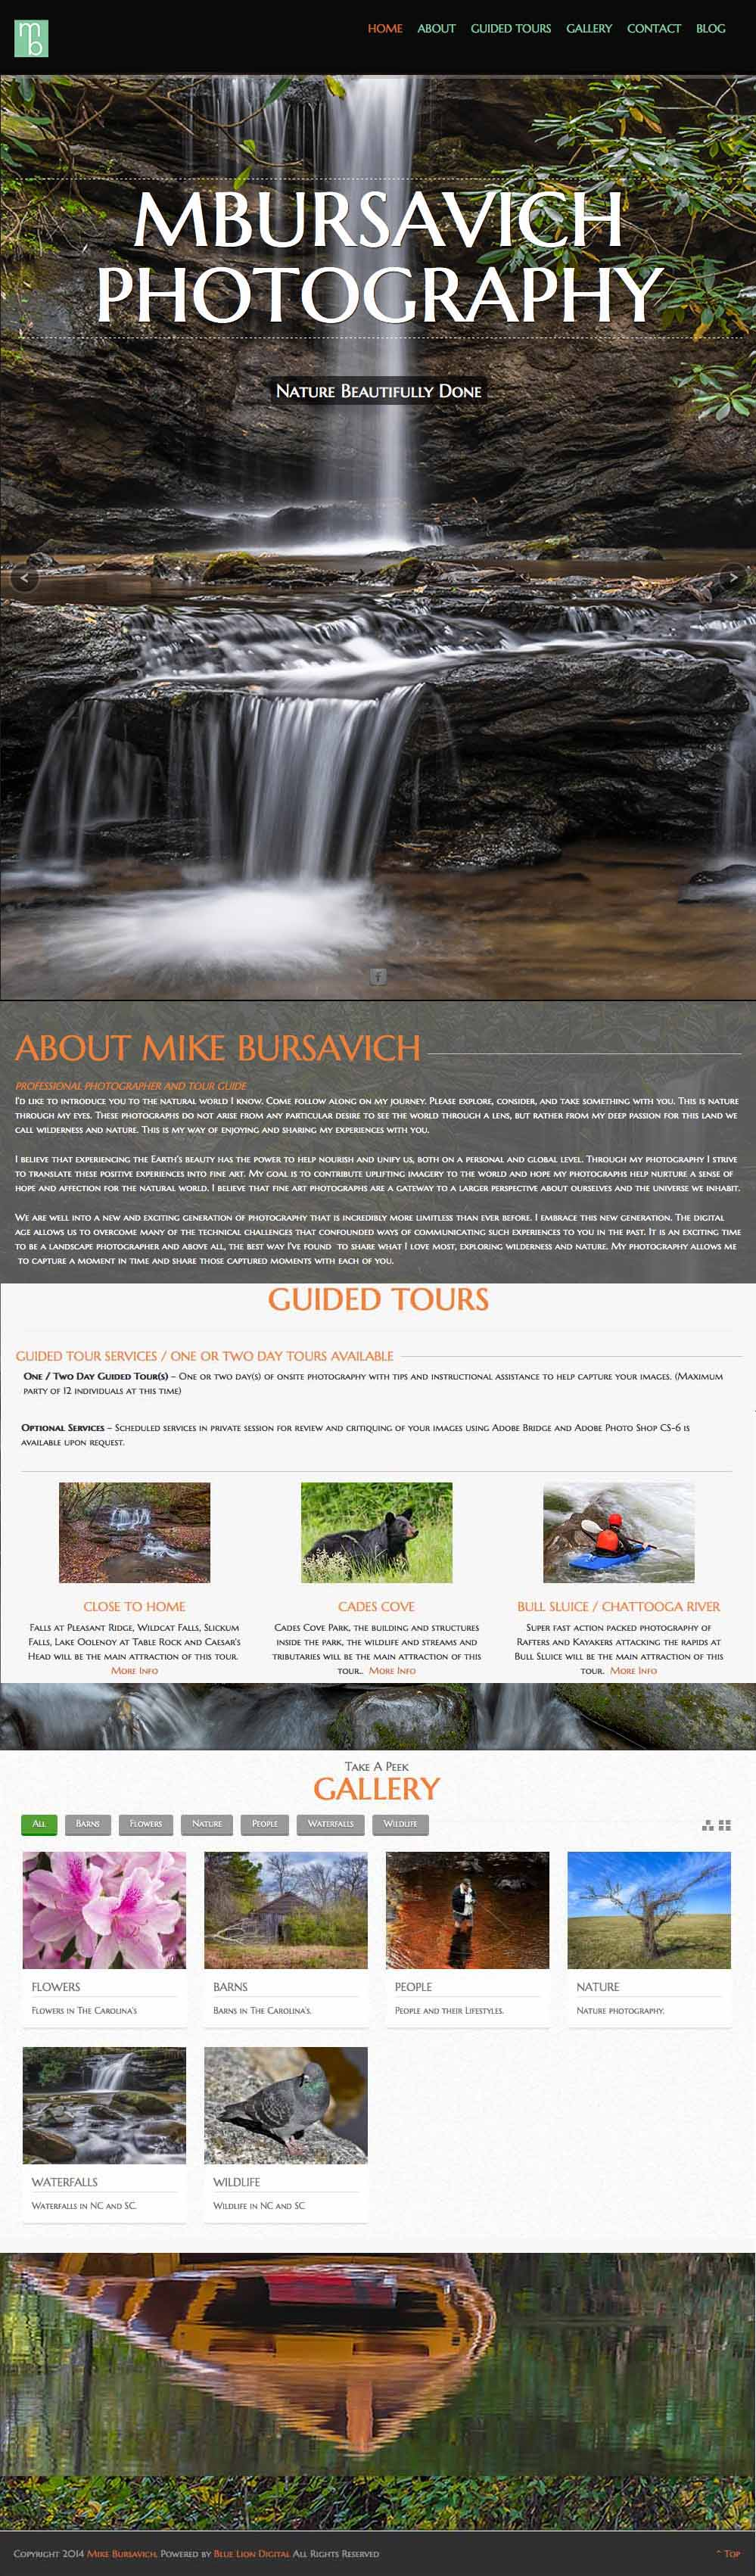 bursavich website entire